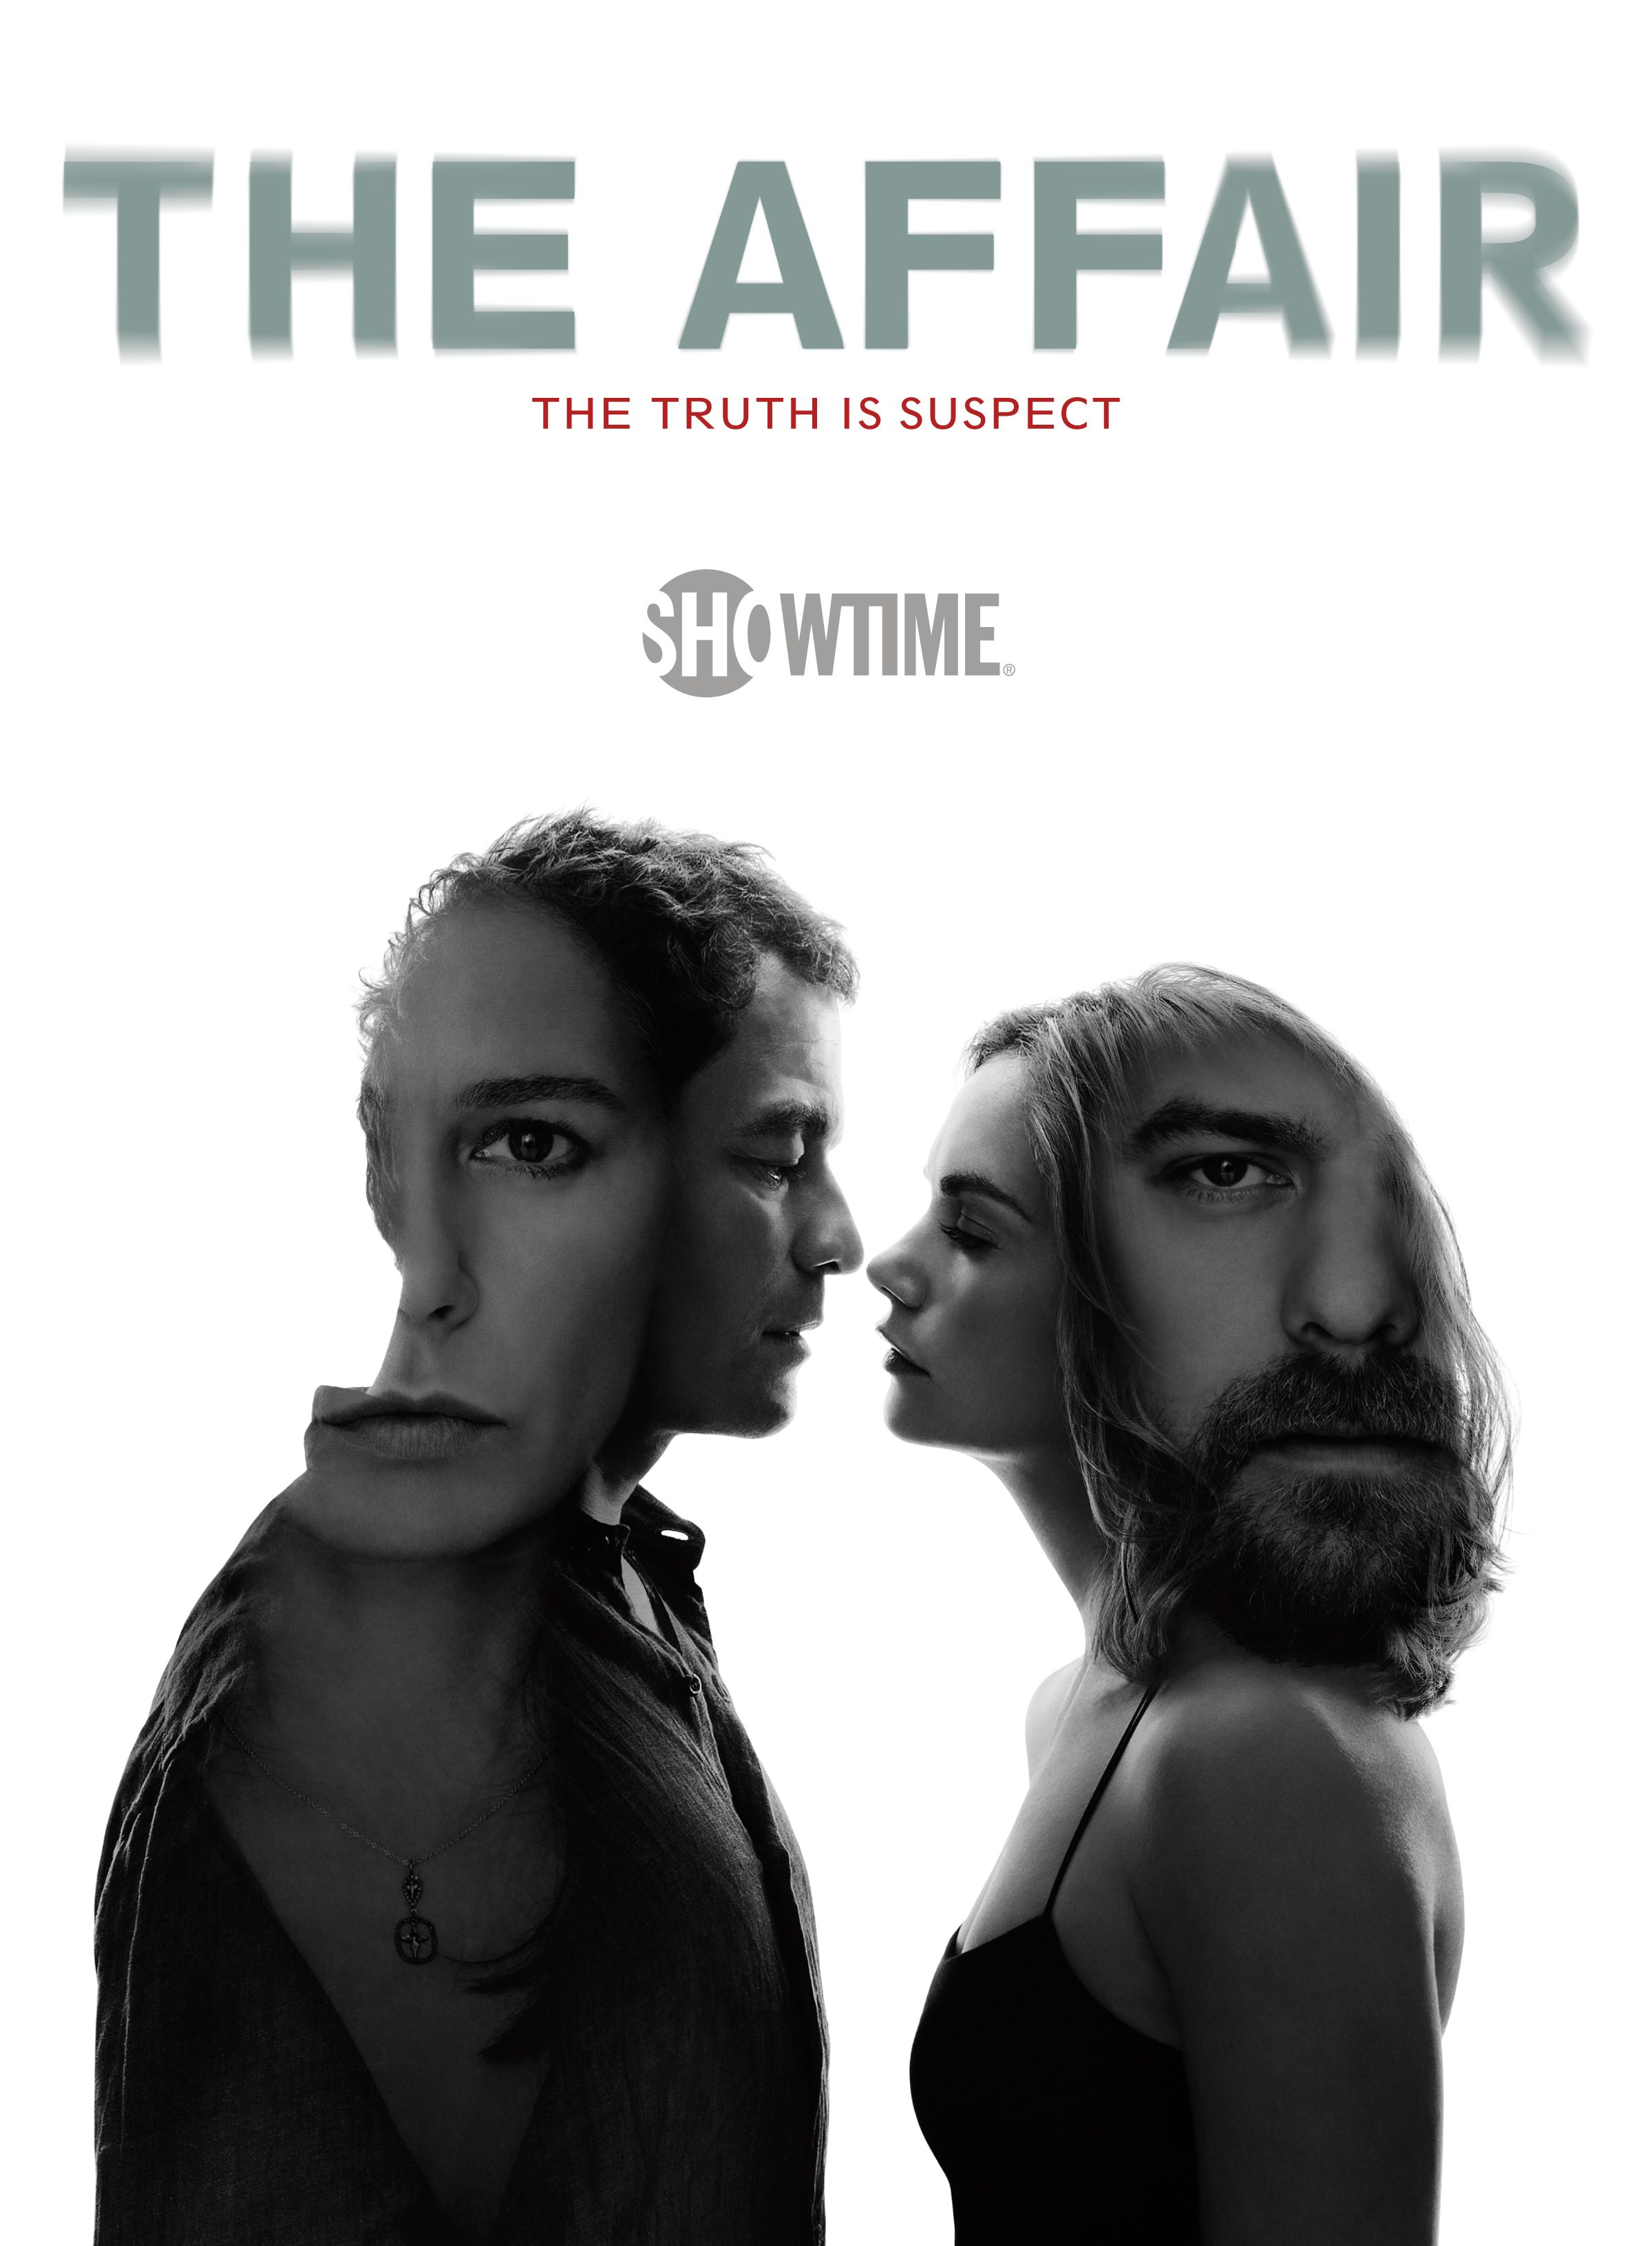 Joshua Jackson Talks \'The Affair\' Season 2 on Showtime | Collider